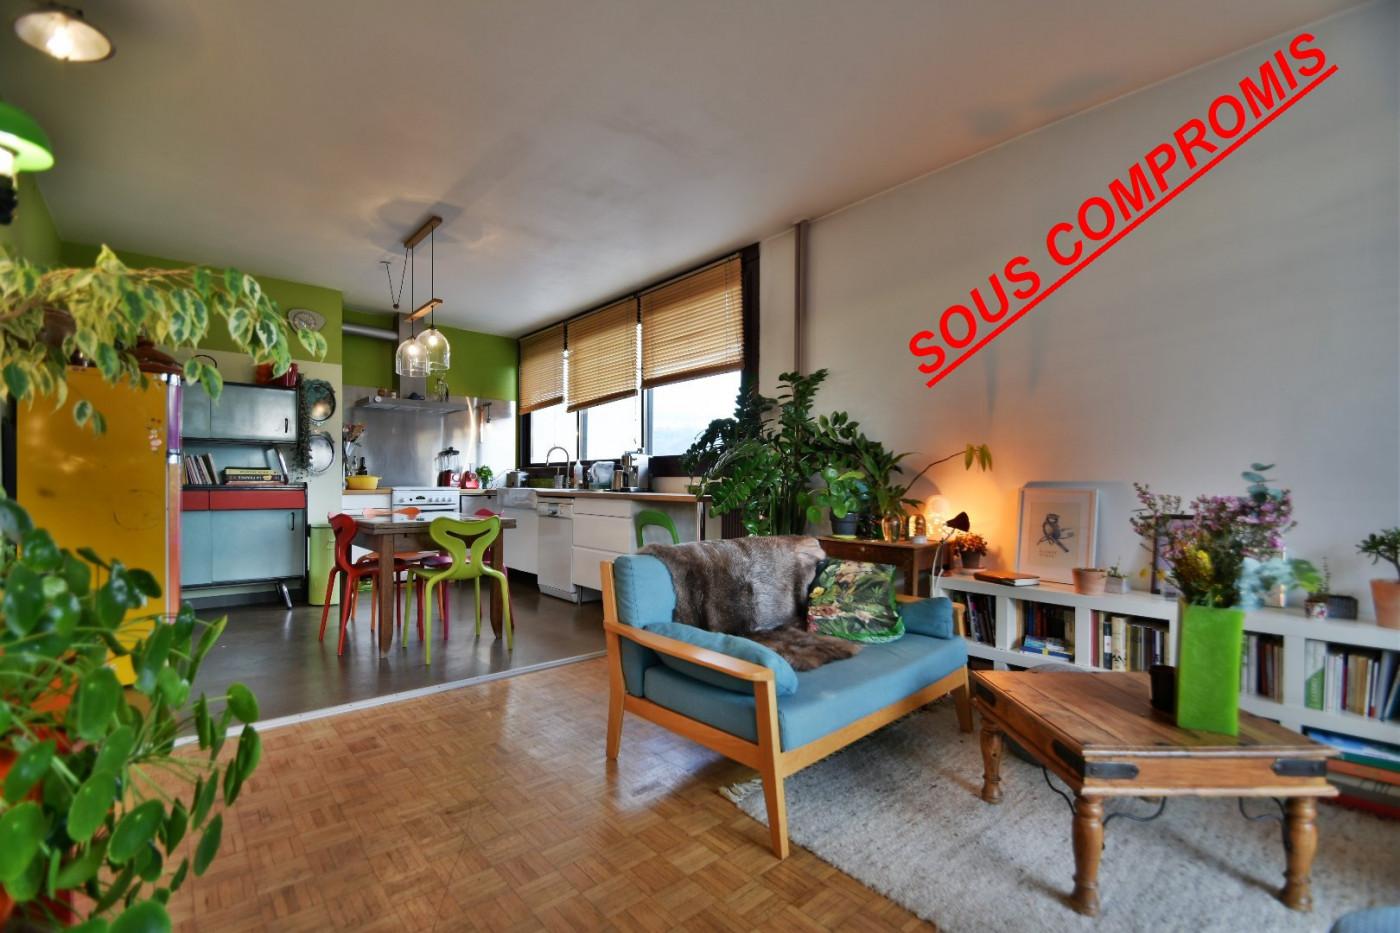 A vendre  Seynod | Réf 7500871709 - Naos immobilier